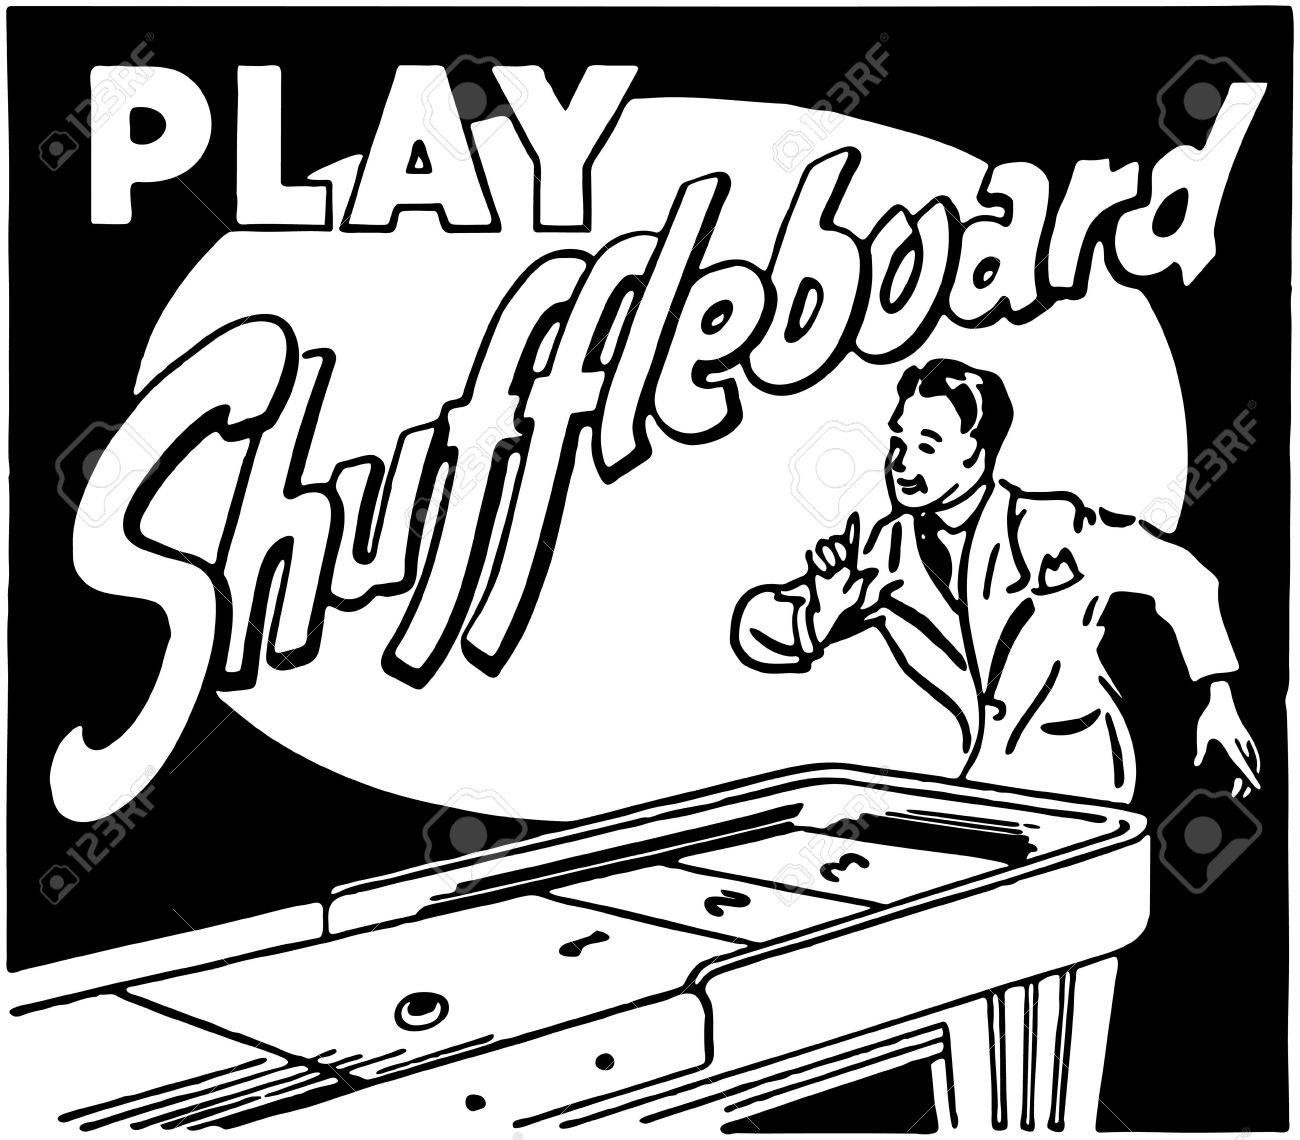 Play Shuffleboard - 28339096